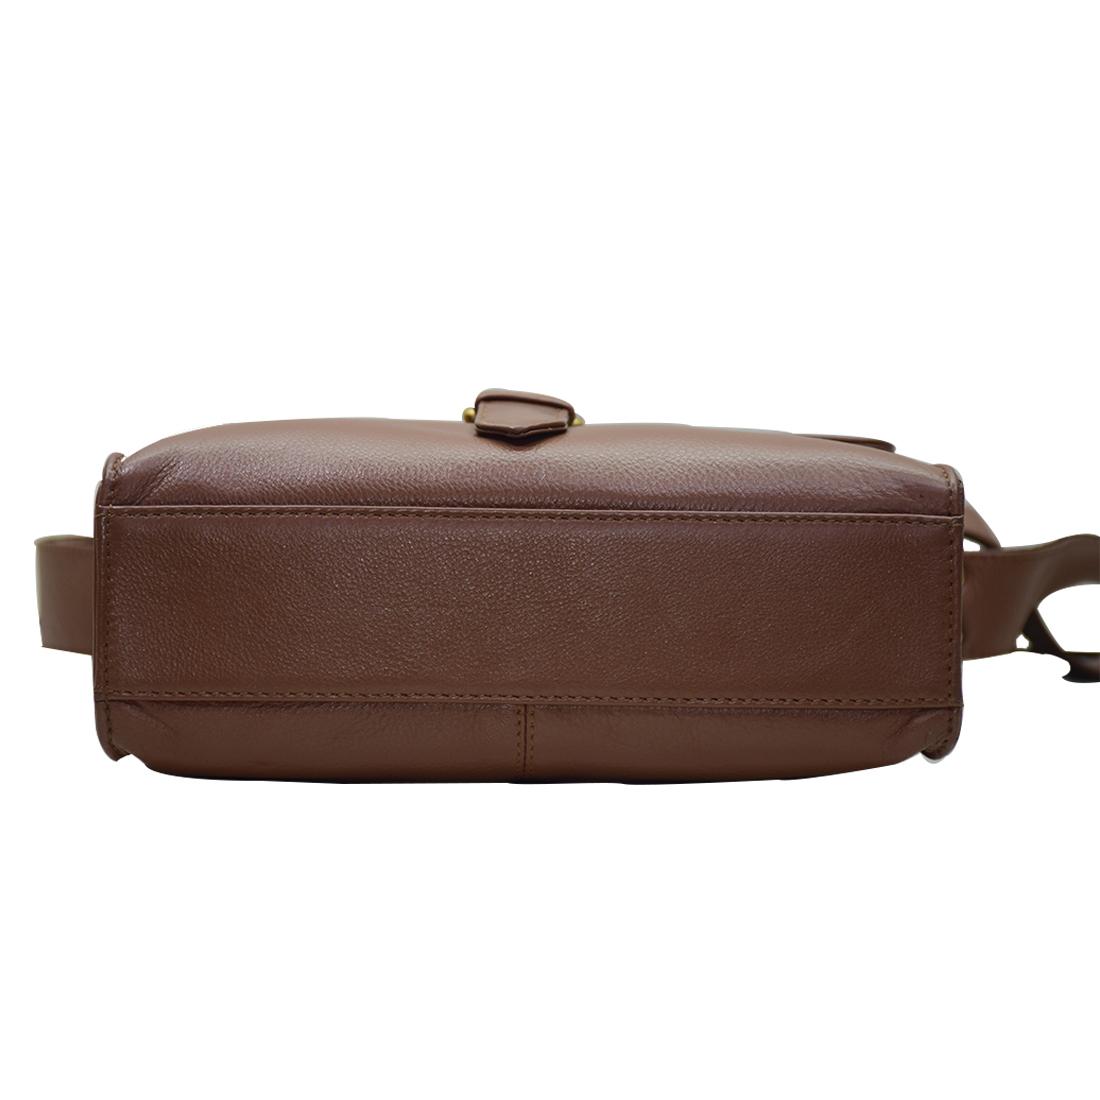 Leather Office Sling Bag